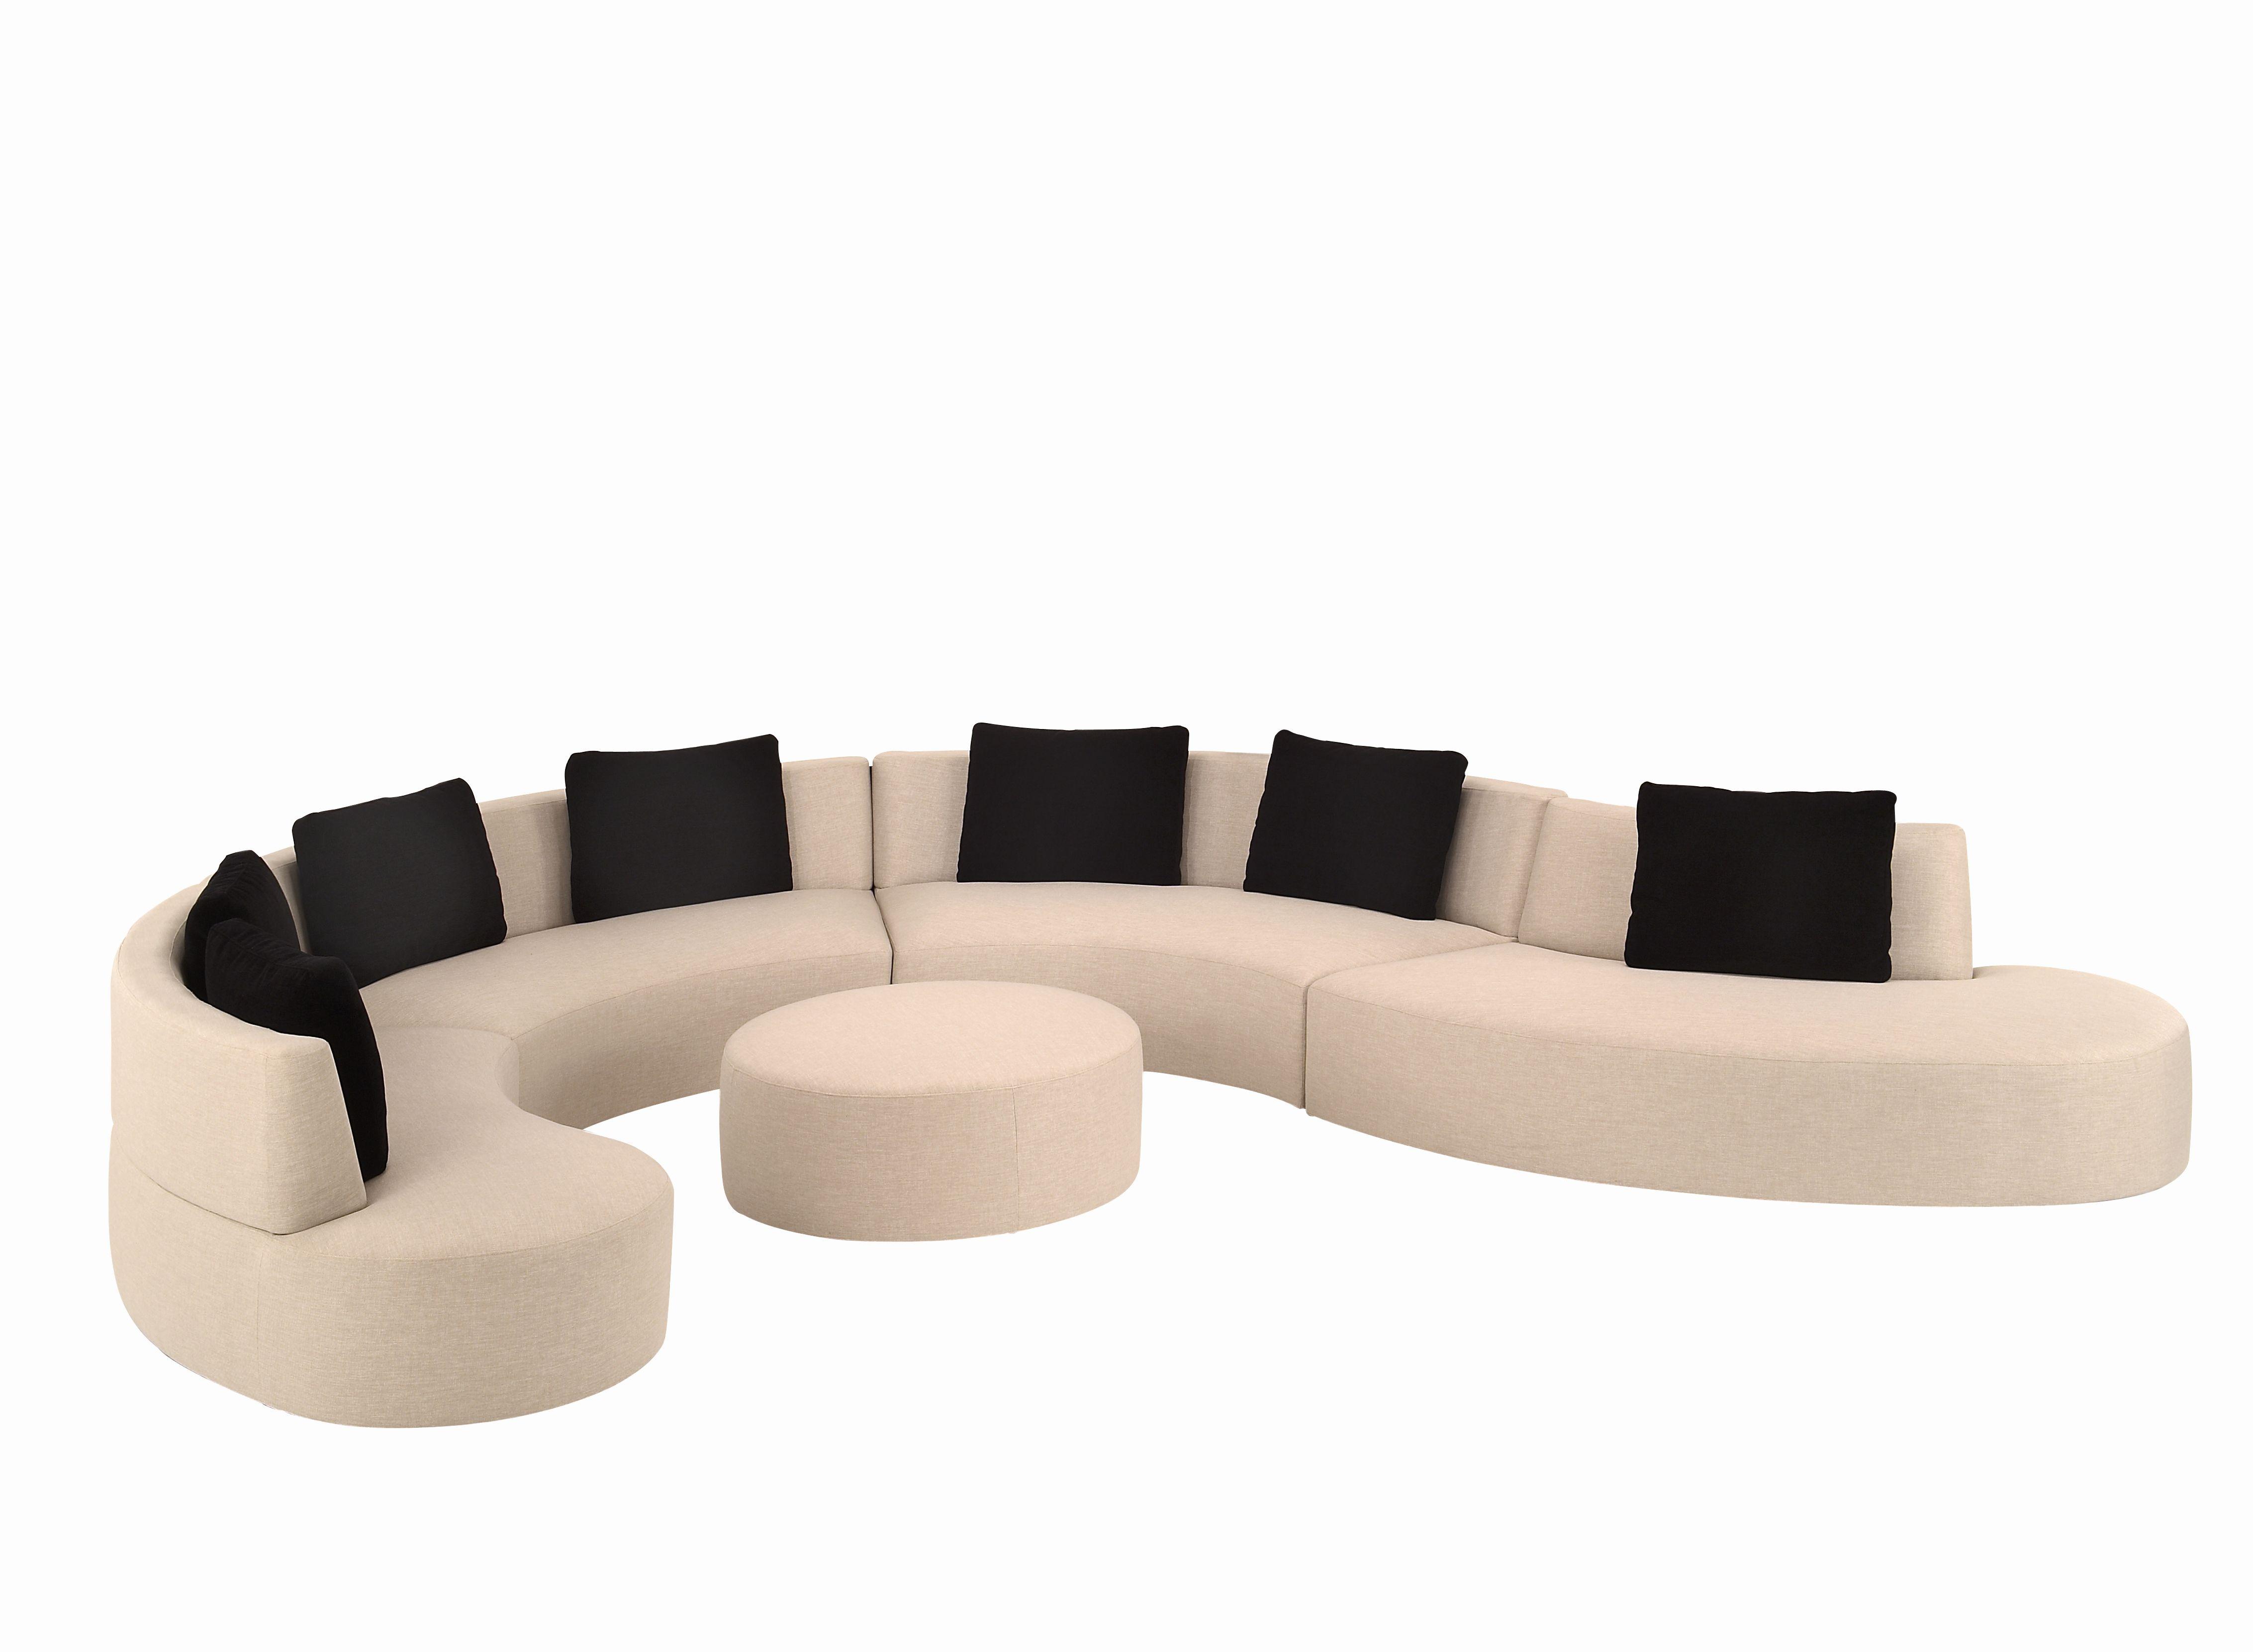 Good Rounded Corner Sectional Sofa Art Lovely 80 Beautiful Enchanting Mesmerizing Small Modern